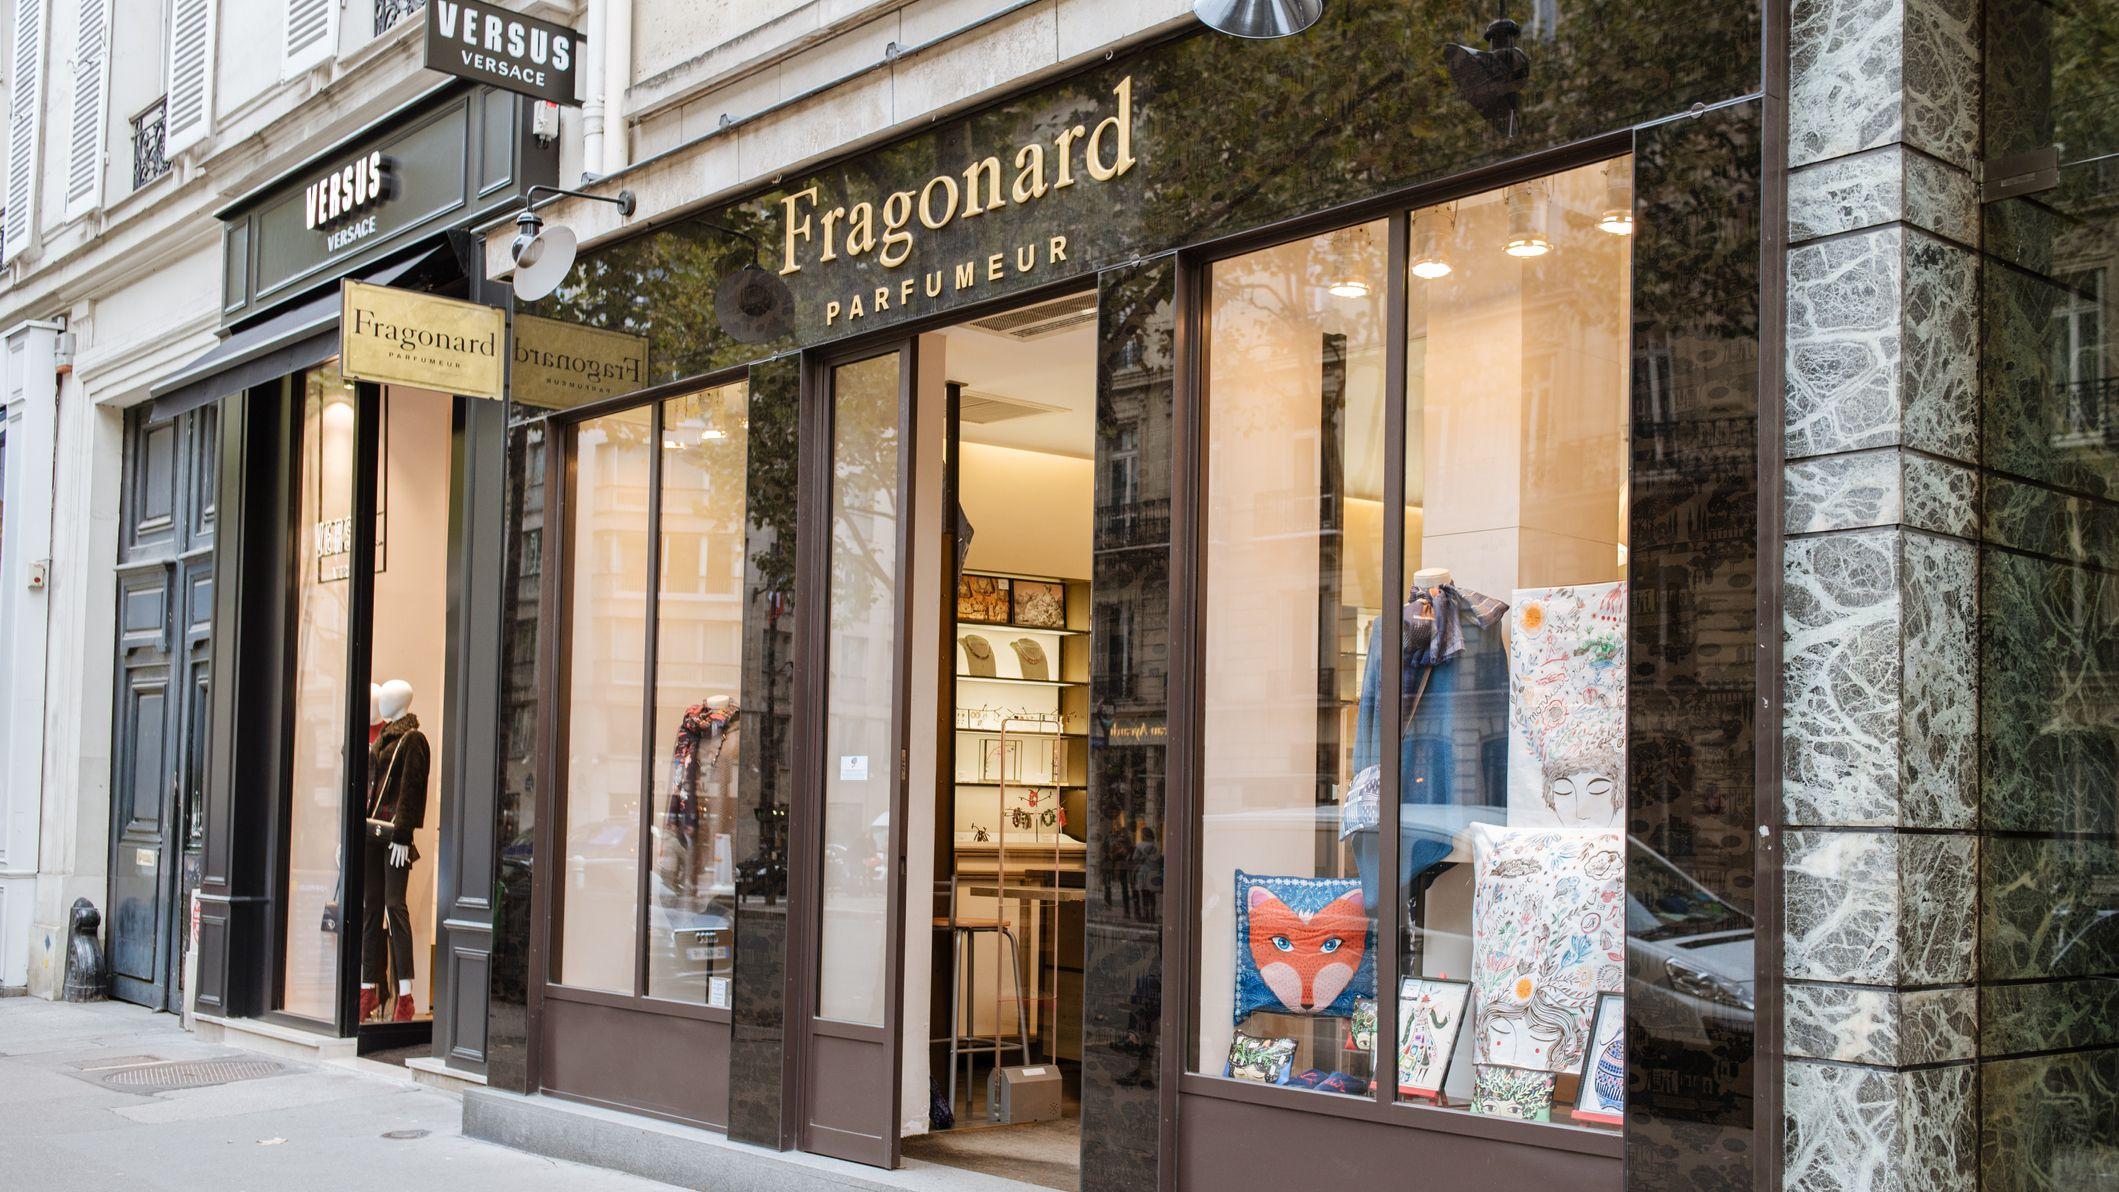 The Top 10 Perfume Shops in Paris